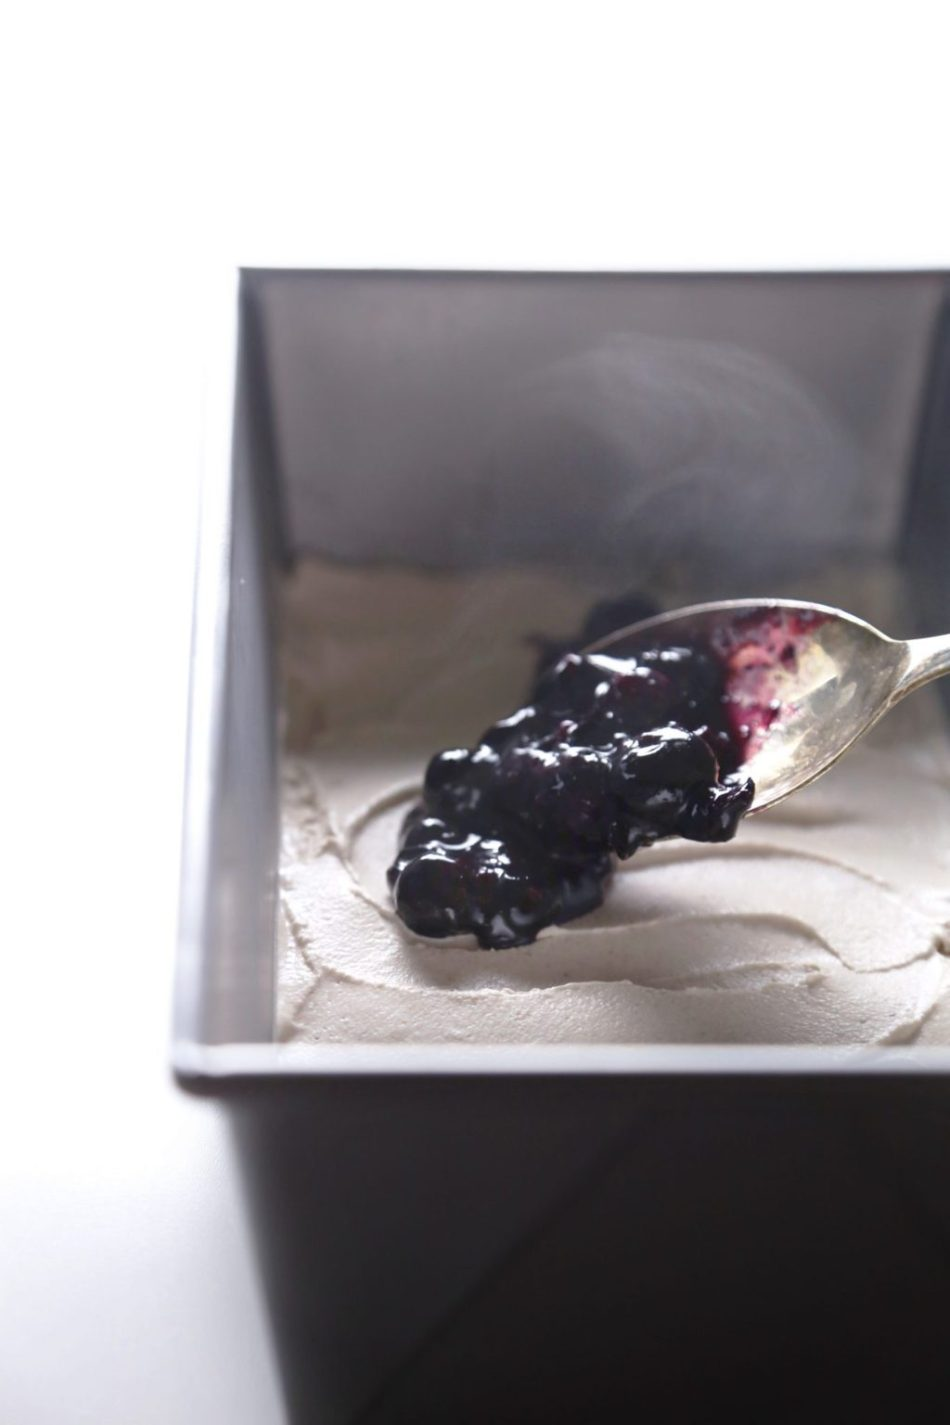 Vegan Blueberry Cheesecake Ice Cream | Free of dairy, gluten, grains, and refined sugar.